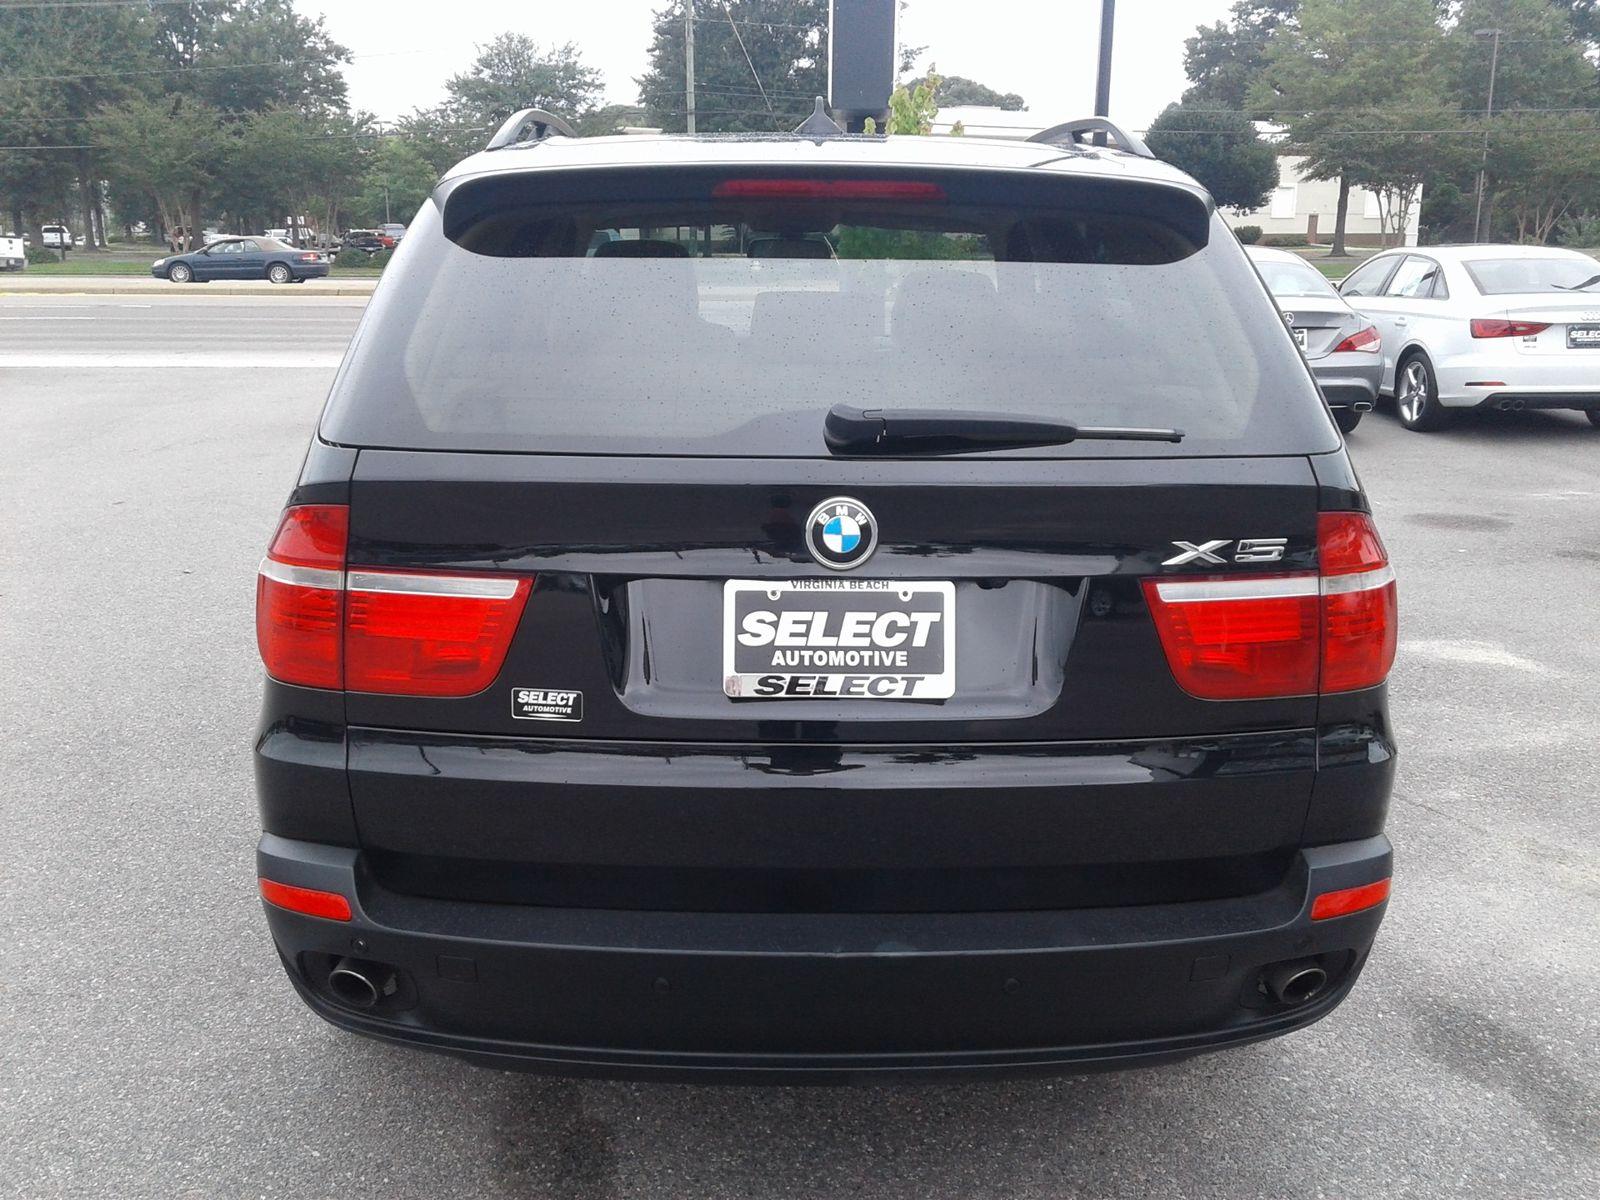 2009 BMW X5 XDrive30i 30i City Virginia Select Automotive VA In Beach